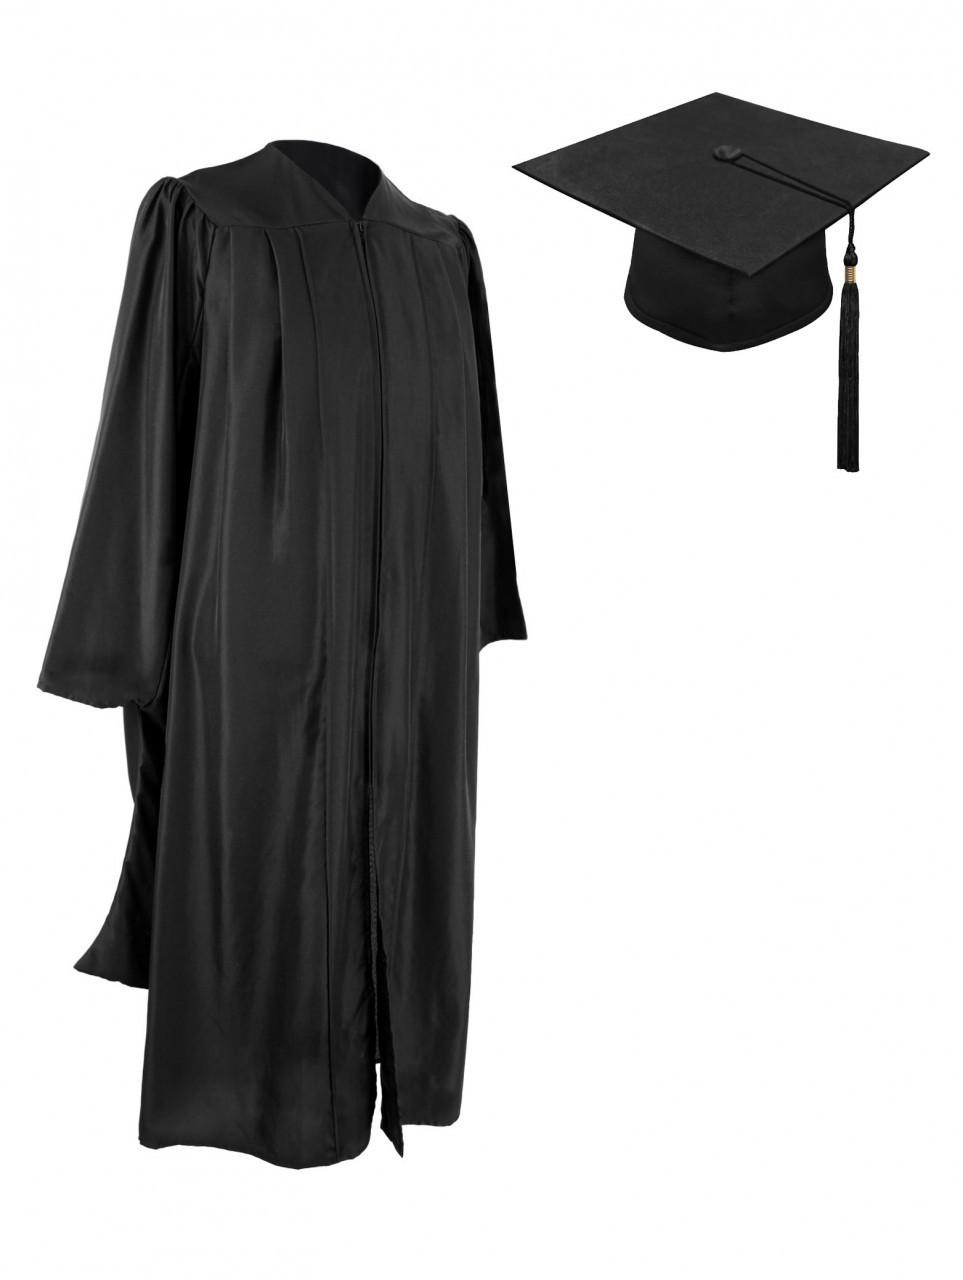 MASTER Executive™ Cap, Gown & Tassel - Willsie Cap & Gown